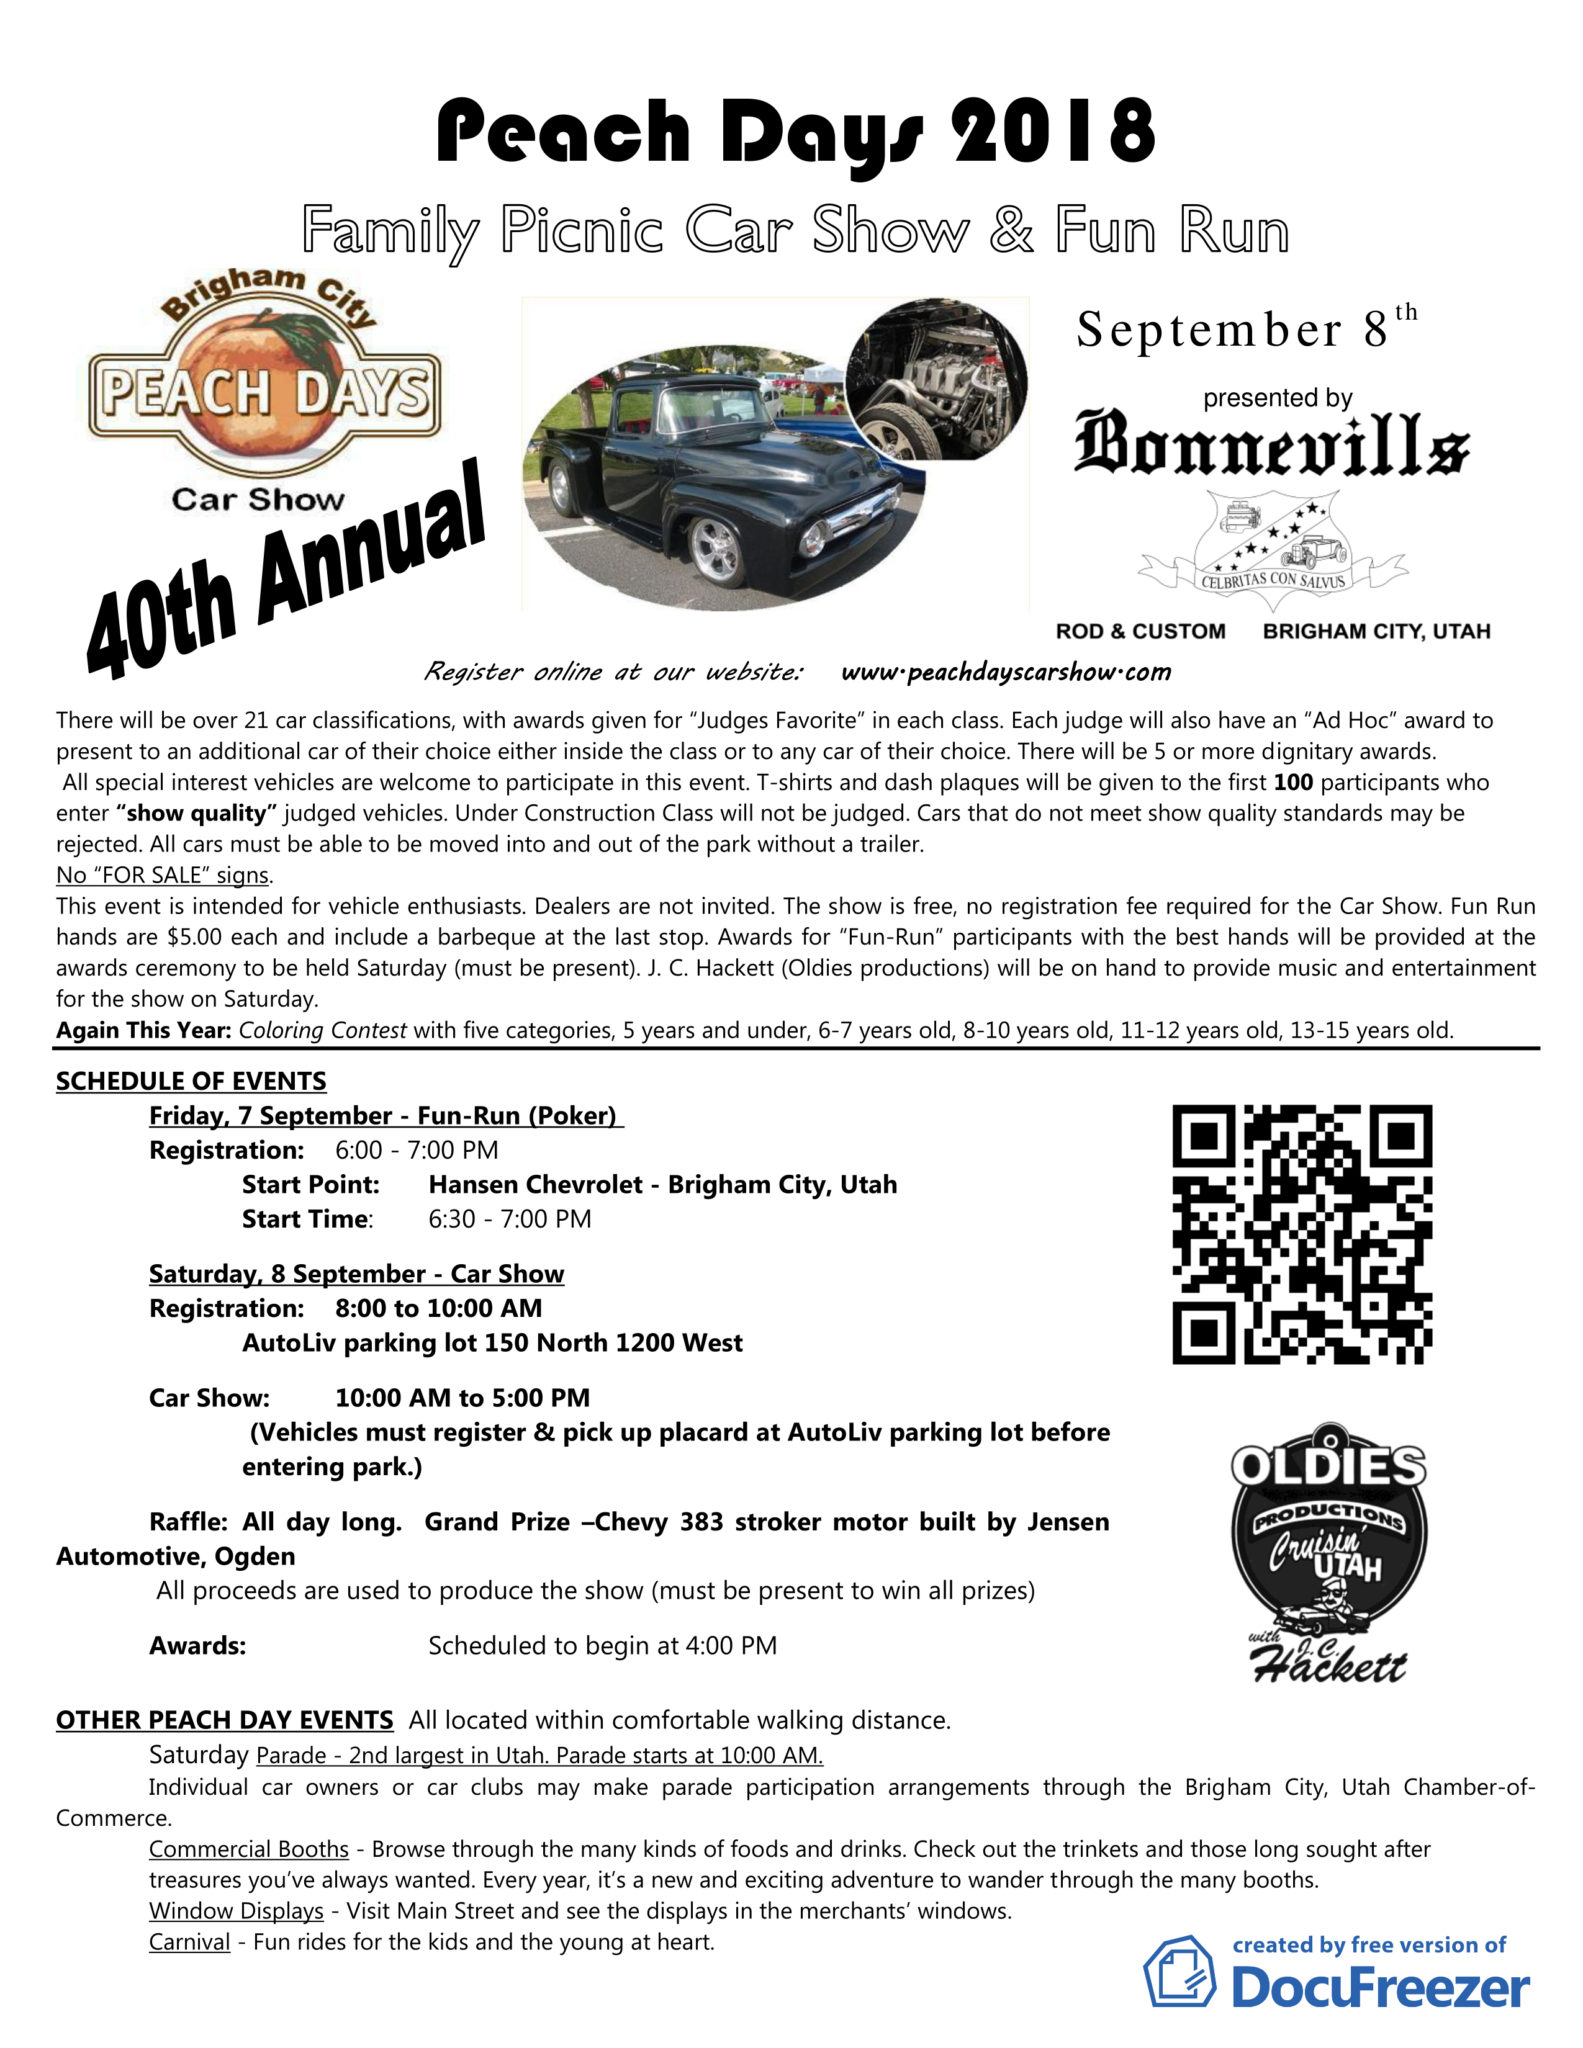 Peach Days Car Show Desert Cruzin - Jc hackett car show calendar